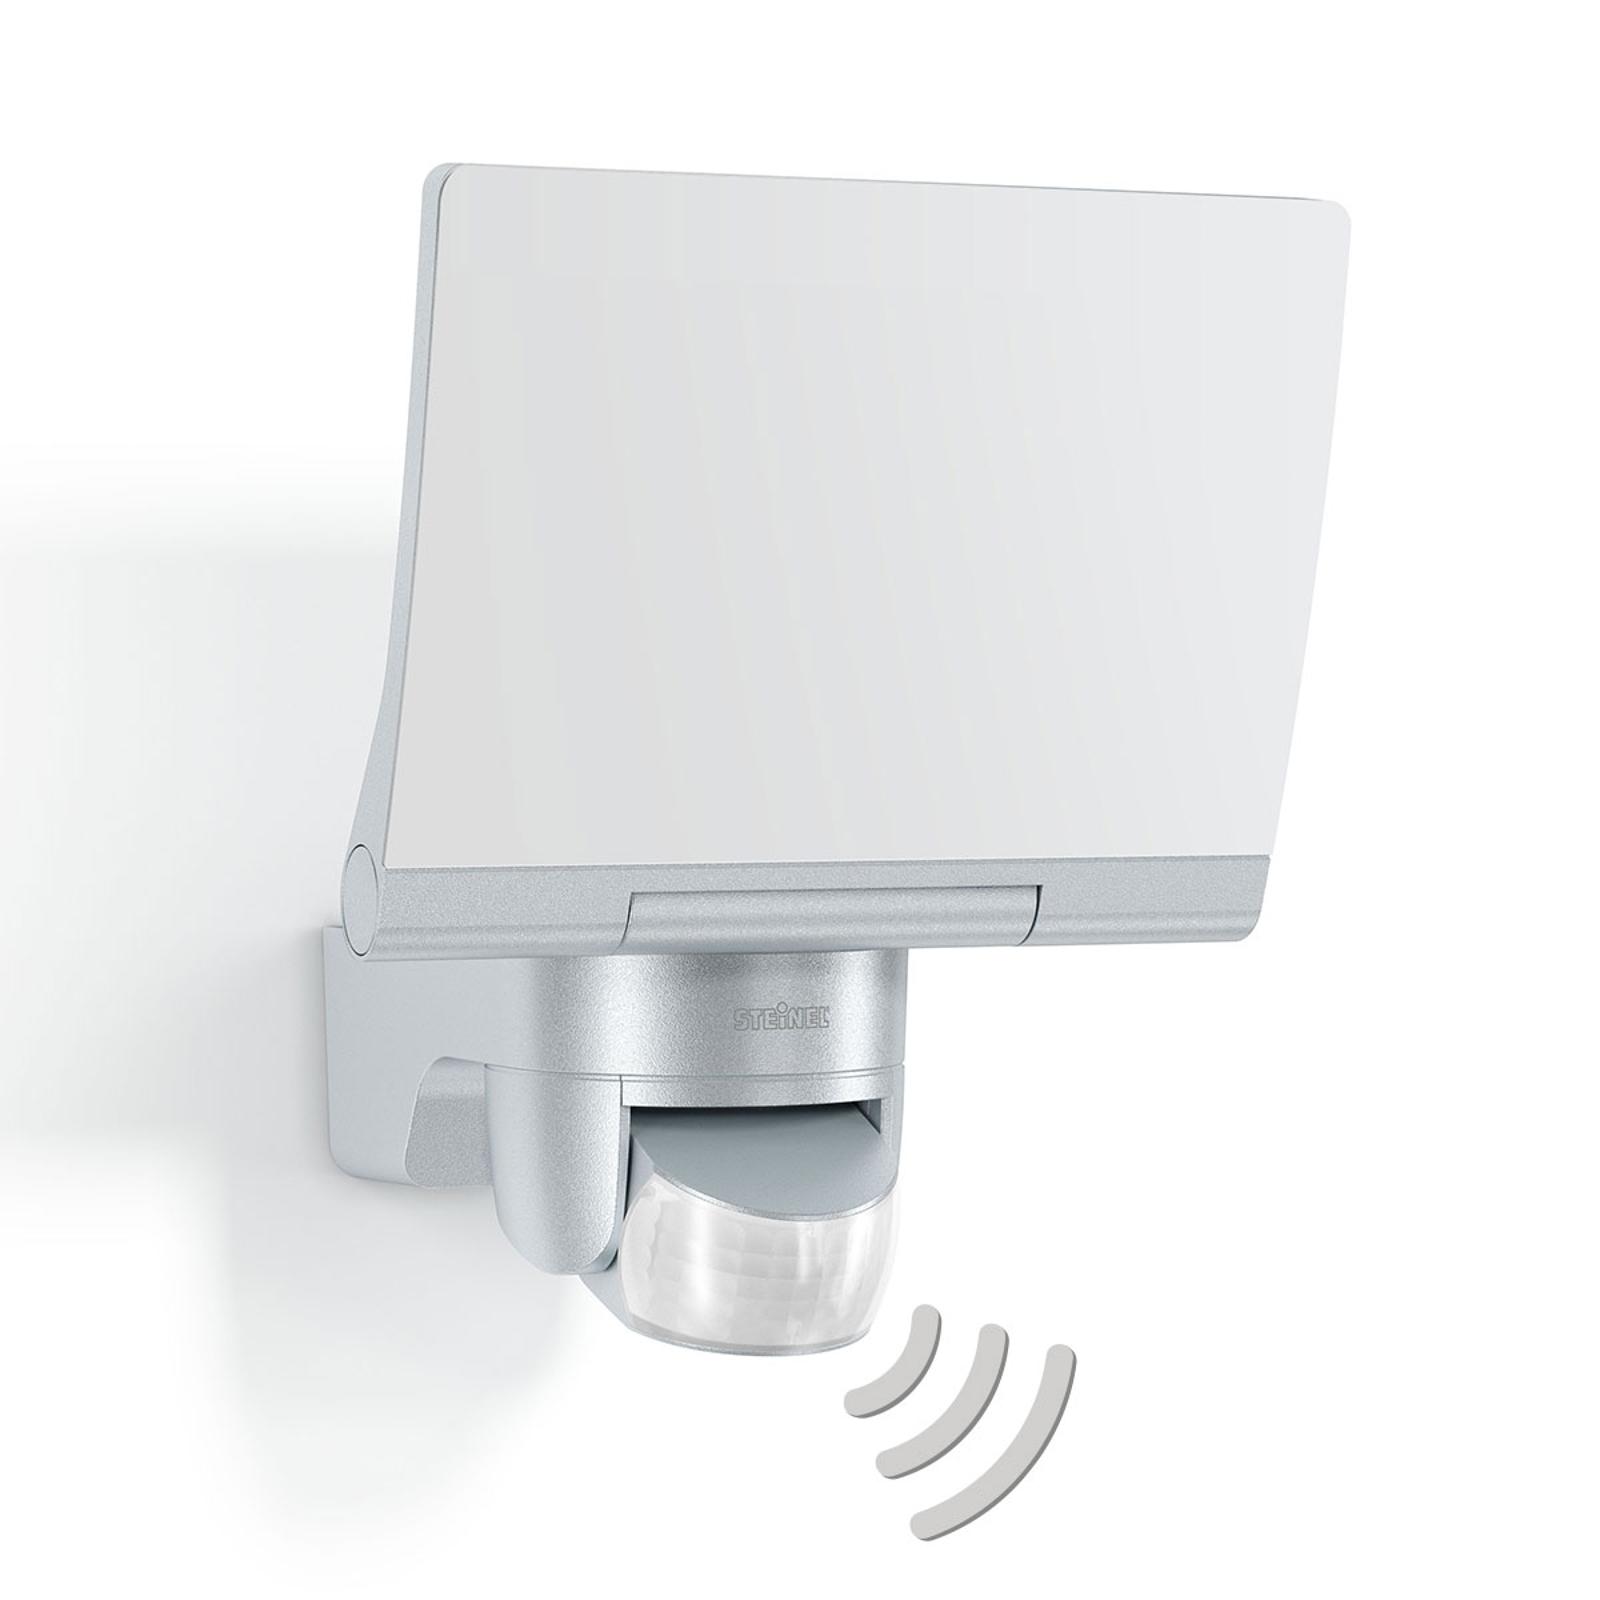 STEINEL XLED Home 2 - buitenspot in zilver, sensor